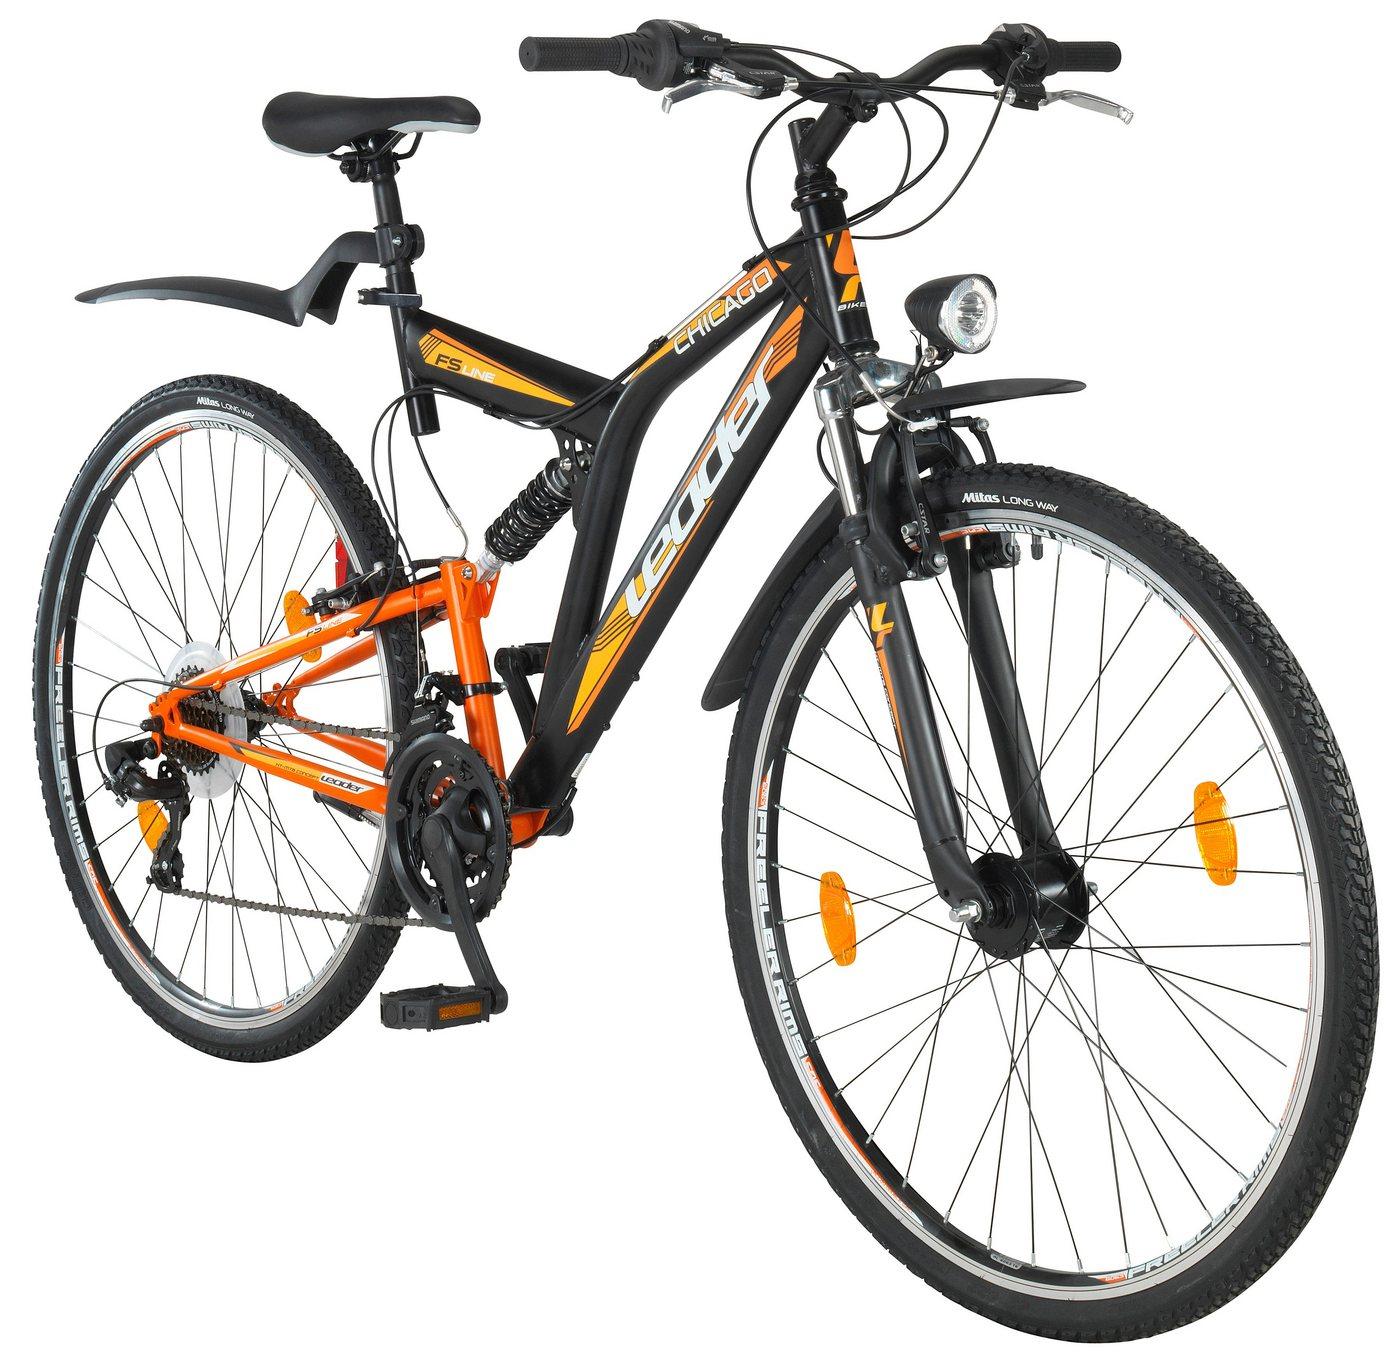 Leader All-Terrain-Bike 21 Gang, V-Bremsen